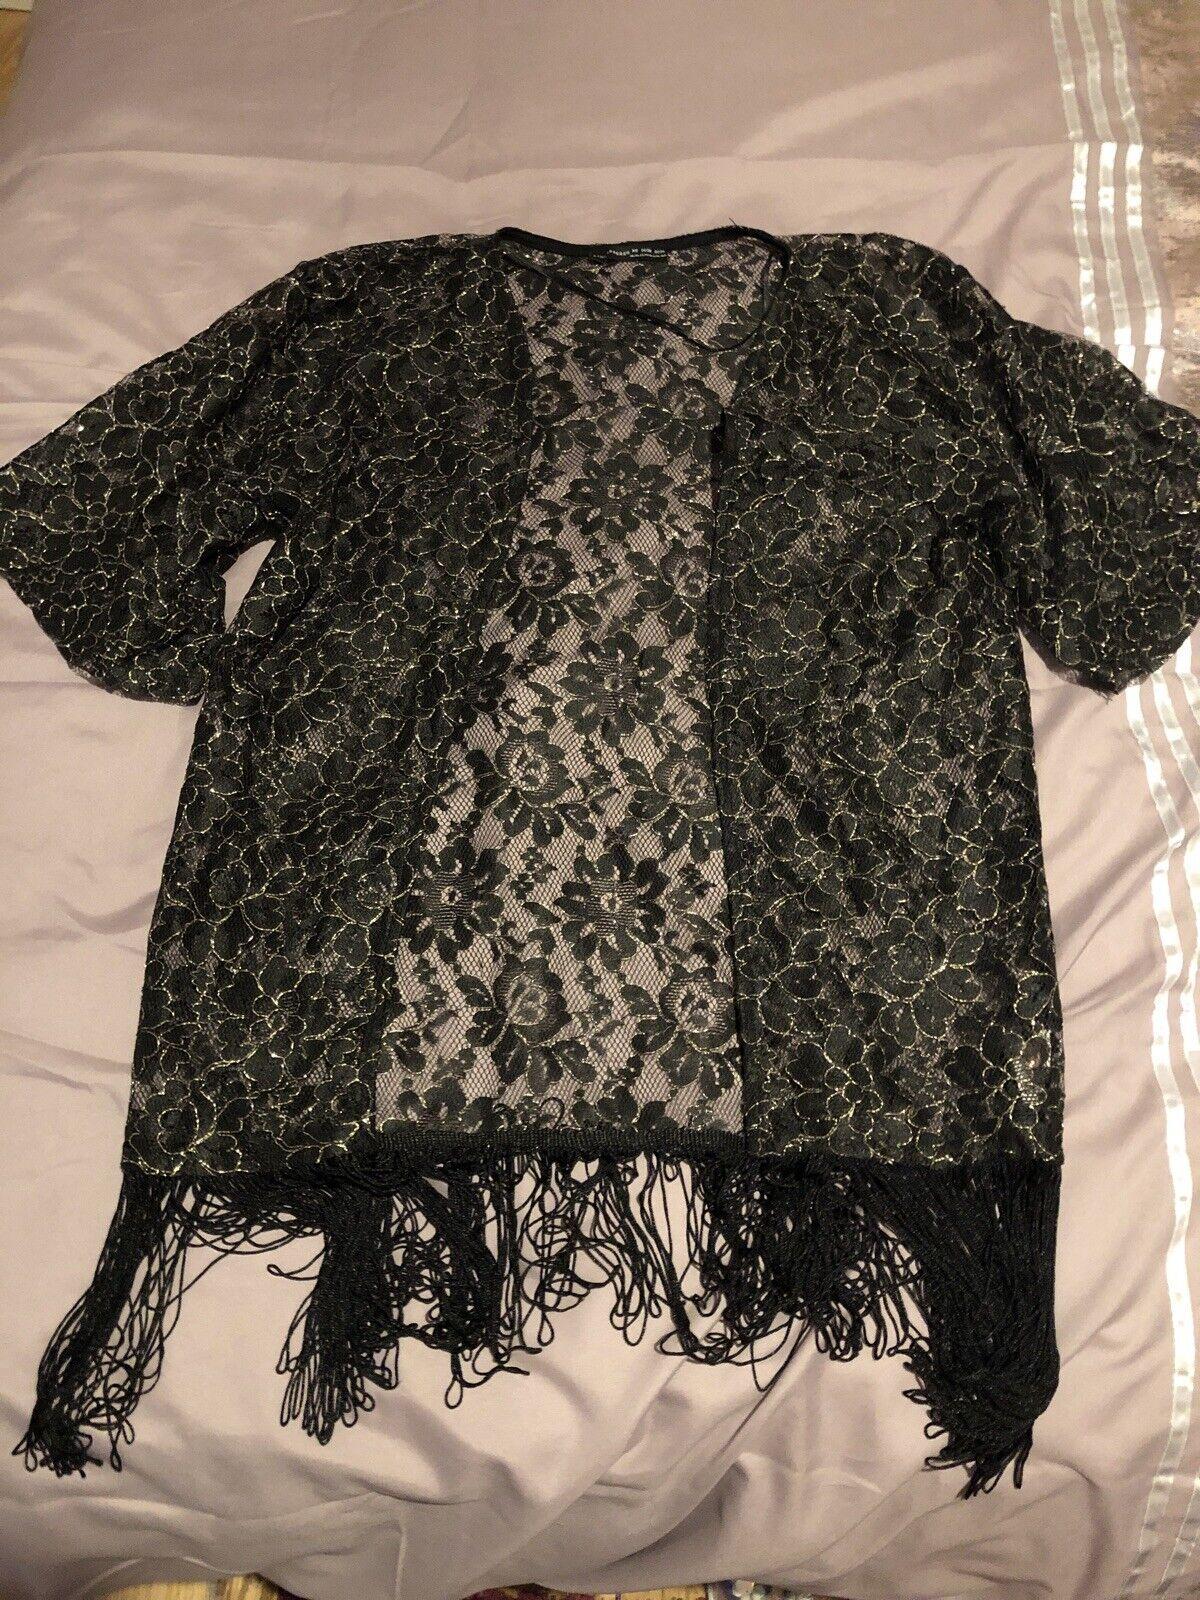 Primark atmosphere Xs size 6/8 black tassle gold lace kimono jacket